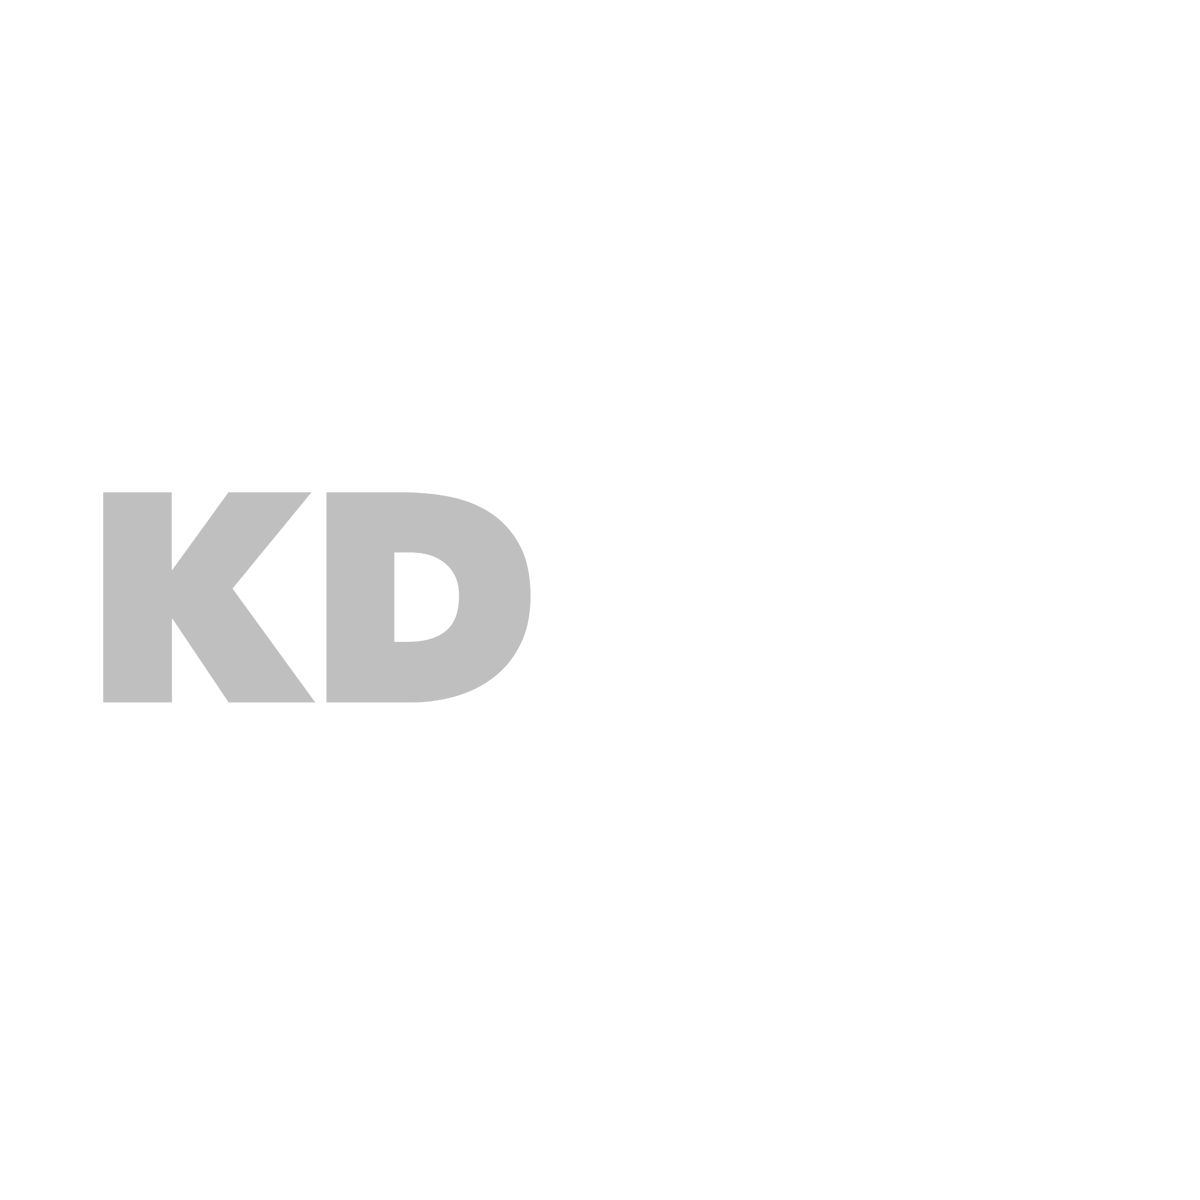 KDUZH Logo